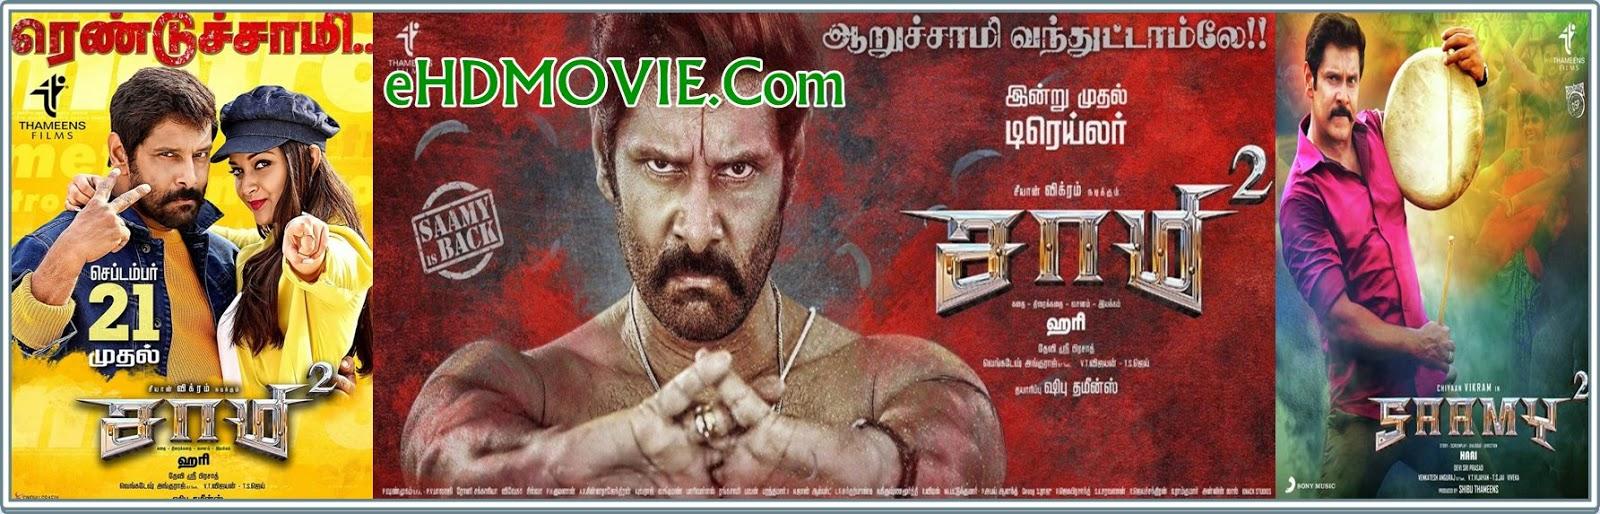 Saamy Square 2018 Full Movie Tamil 720p - 480p ORG HDRip 400MB - 700MB ESubs Free Download